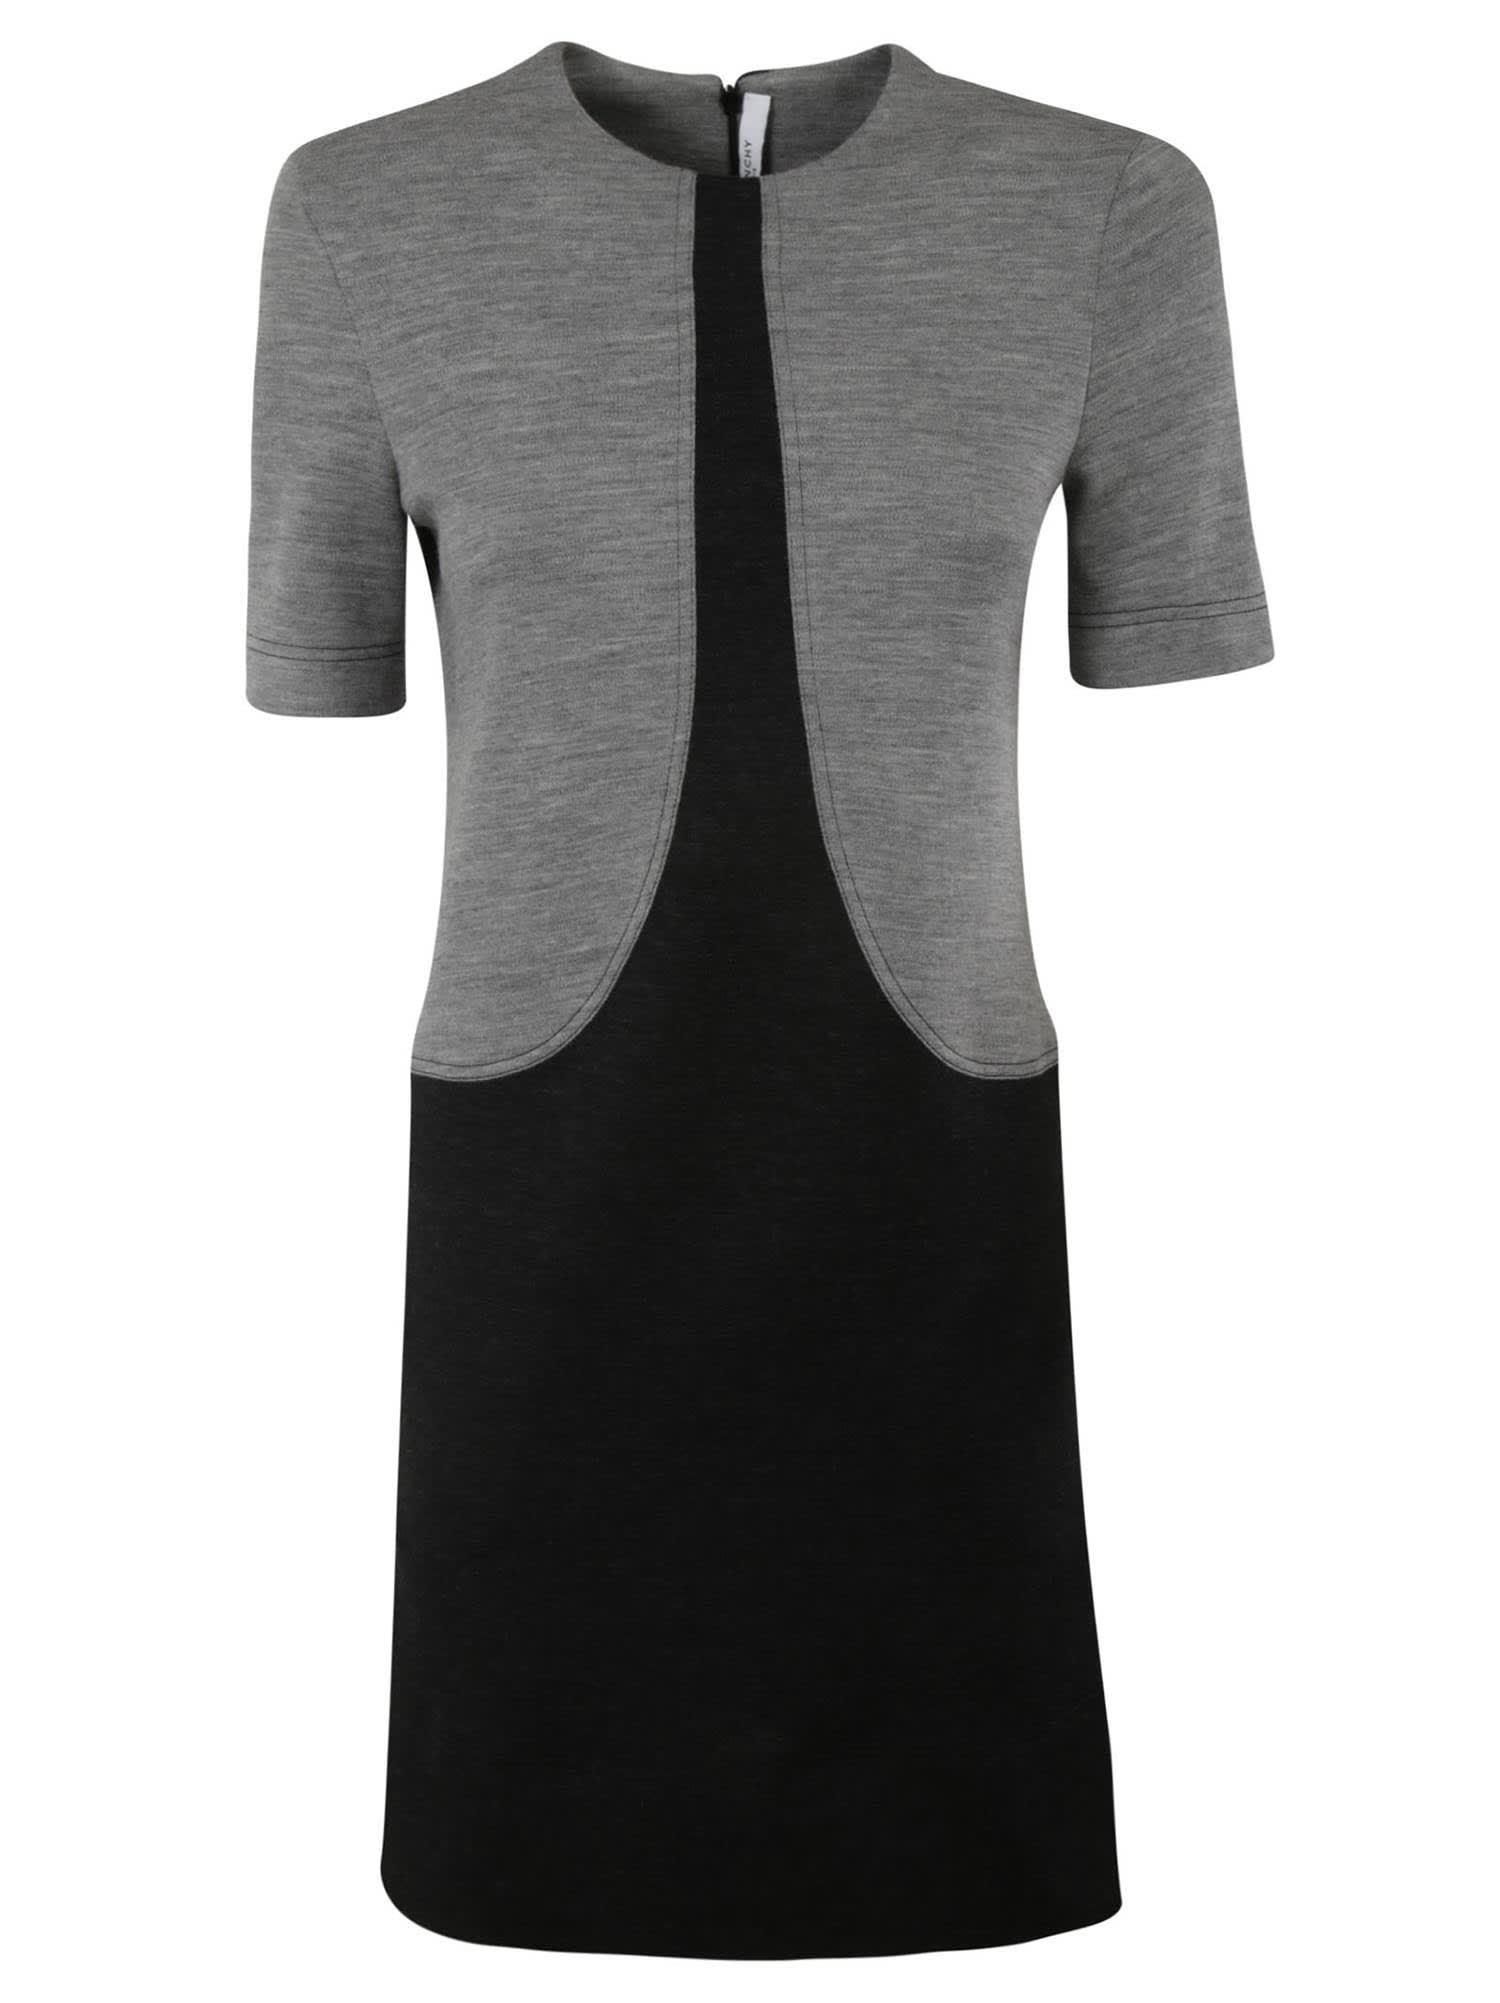 Givenchy Round Neck Short Dress